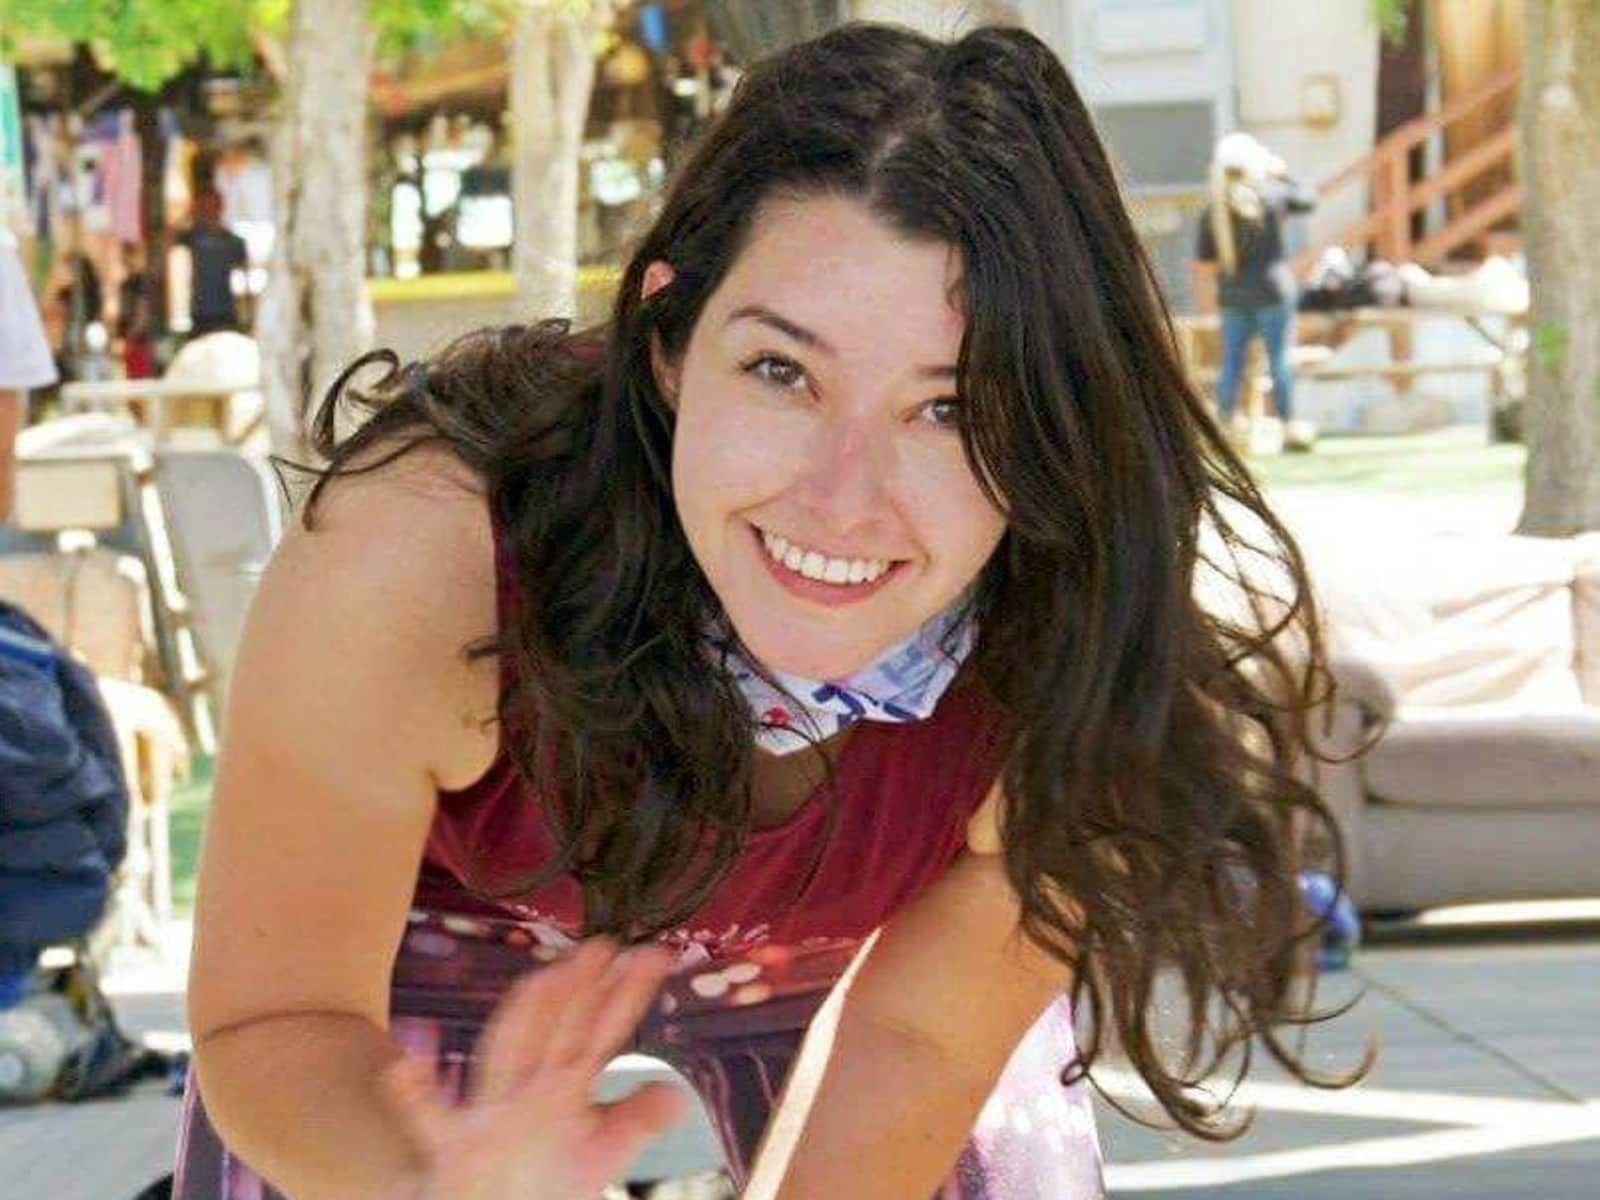 Hanna from New York City, New York, United States